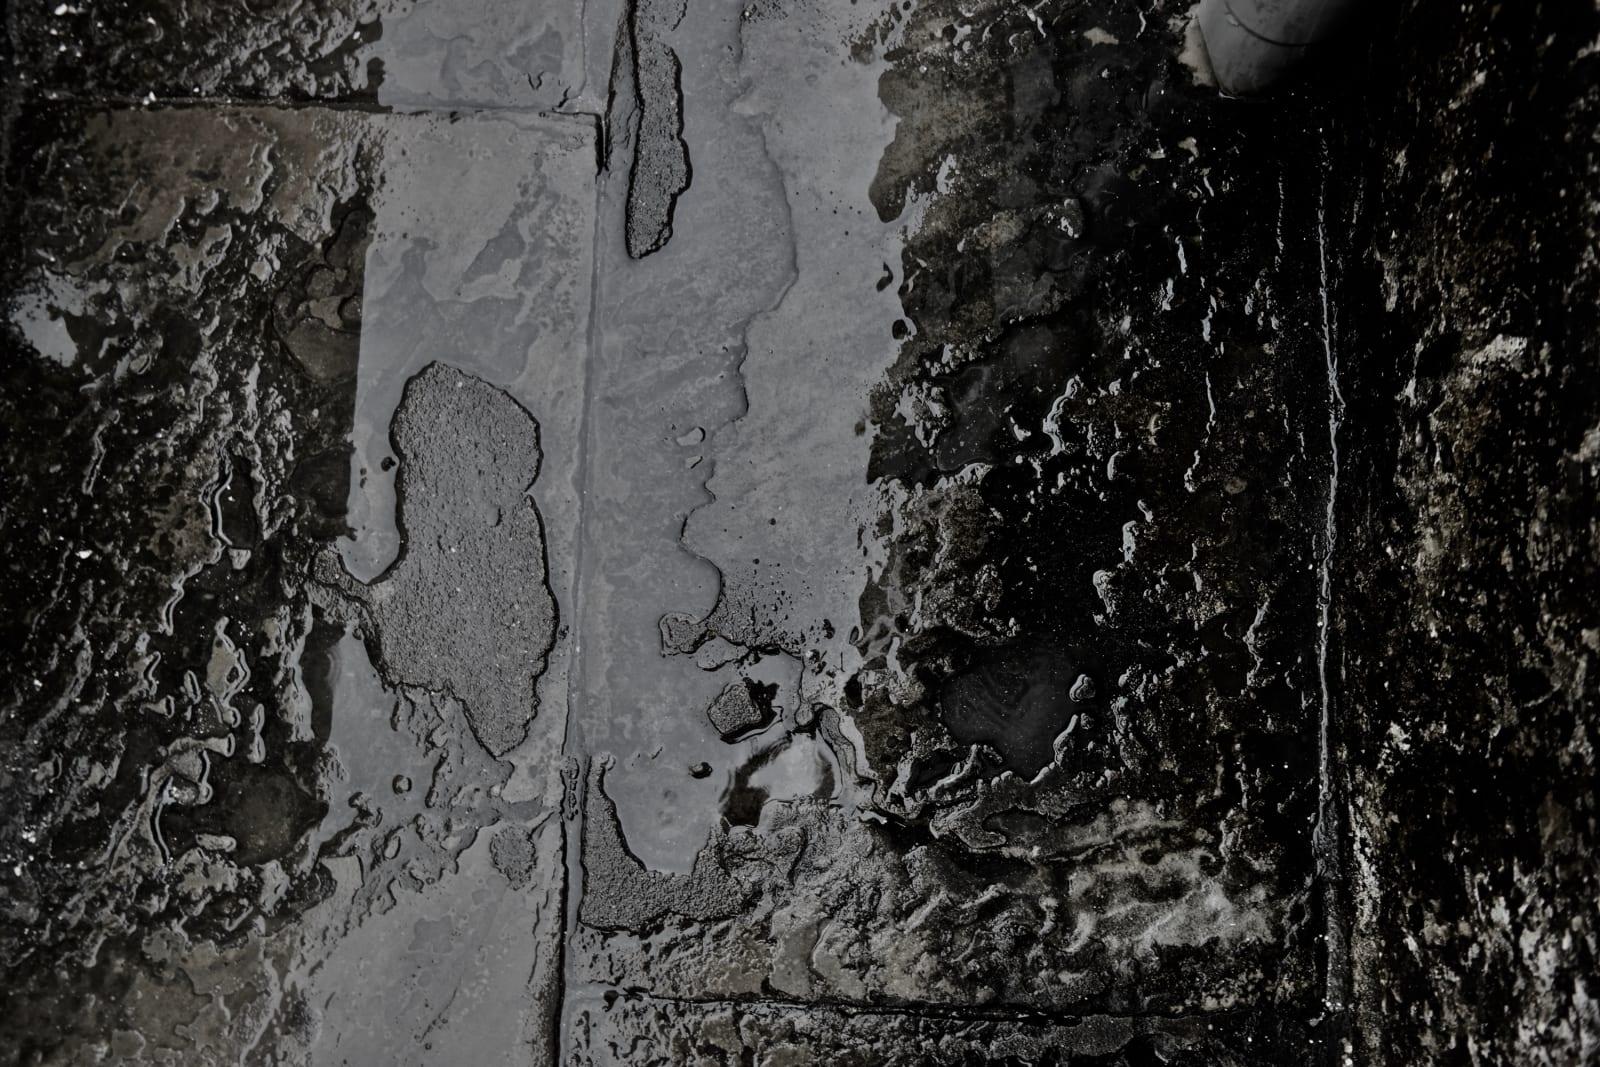 Latifah Iddriss nostalgia depressed - wet i (inside earth) 42 x 27.67 cm 14.8 x 21 cm Digital print